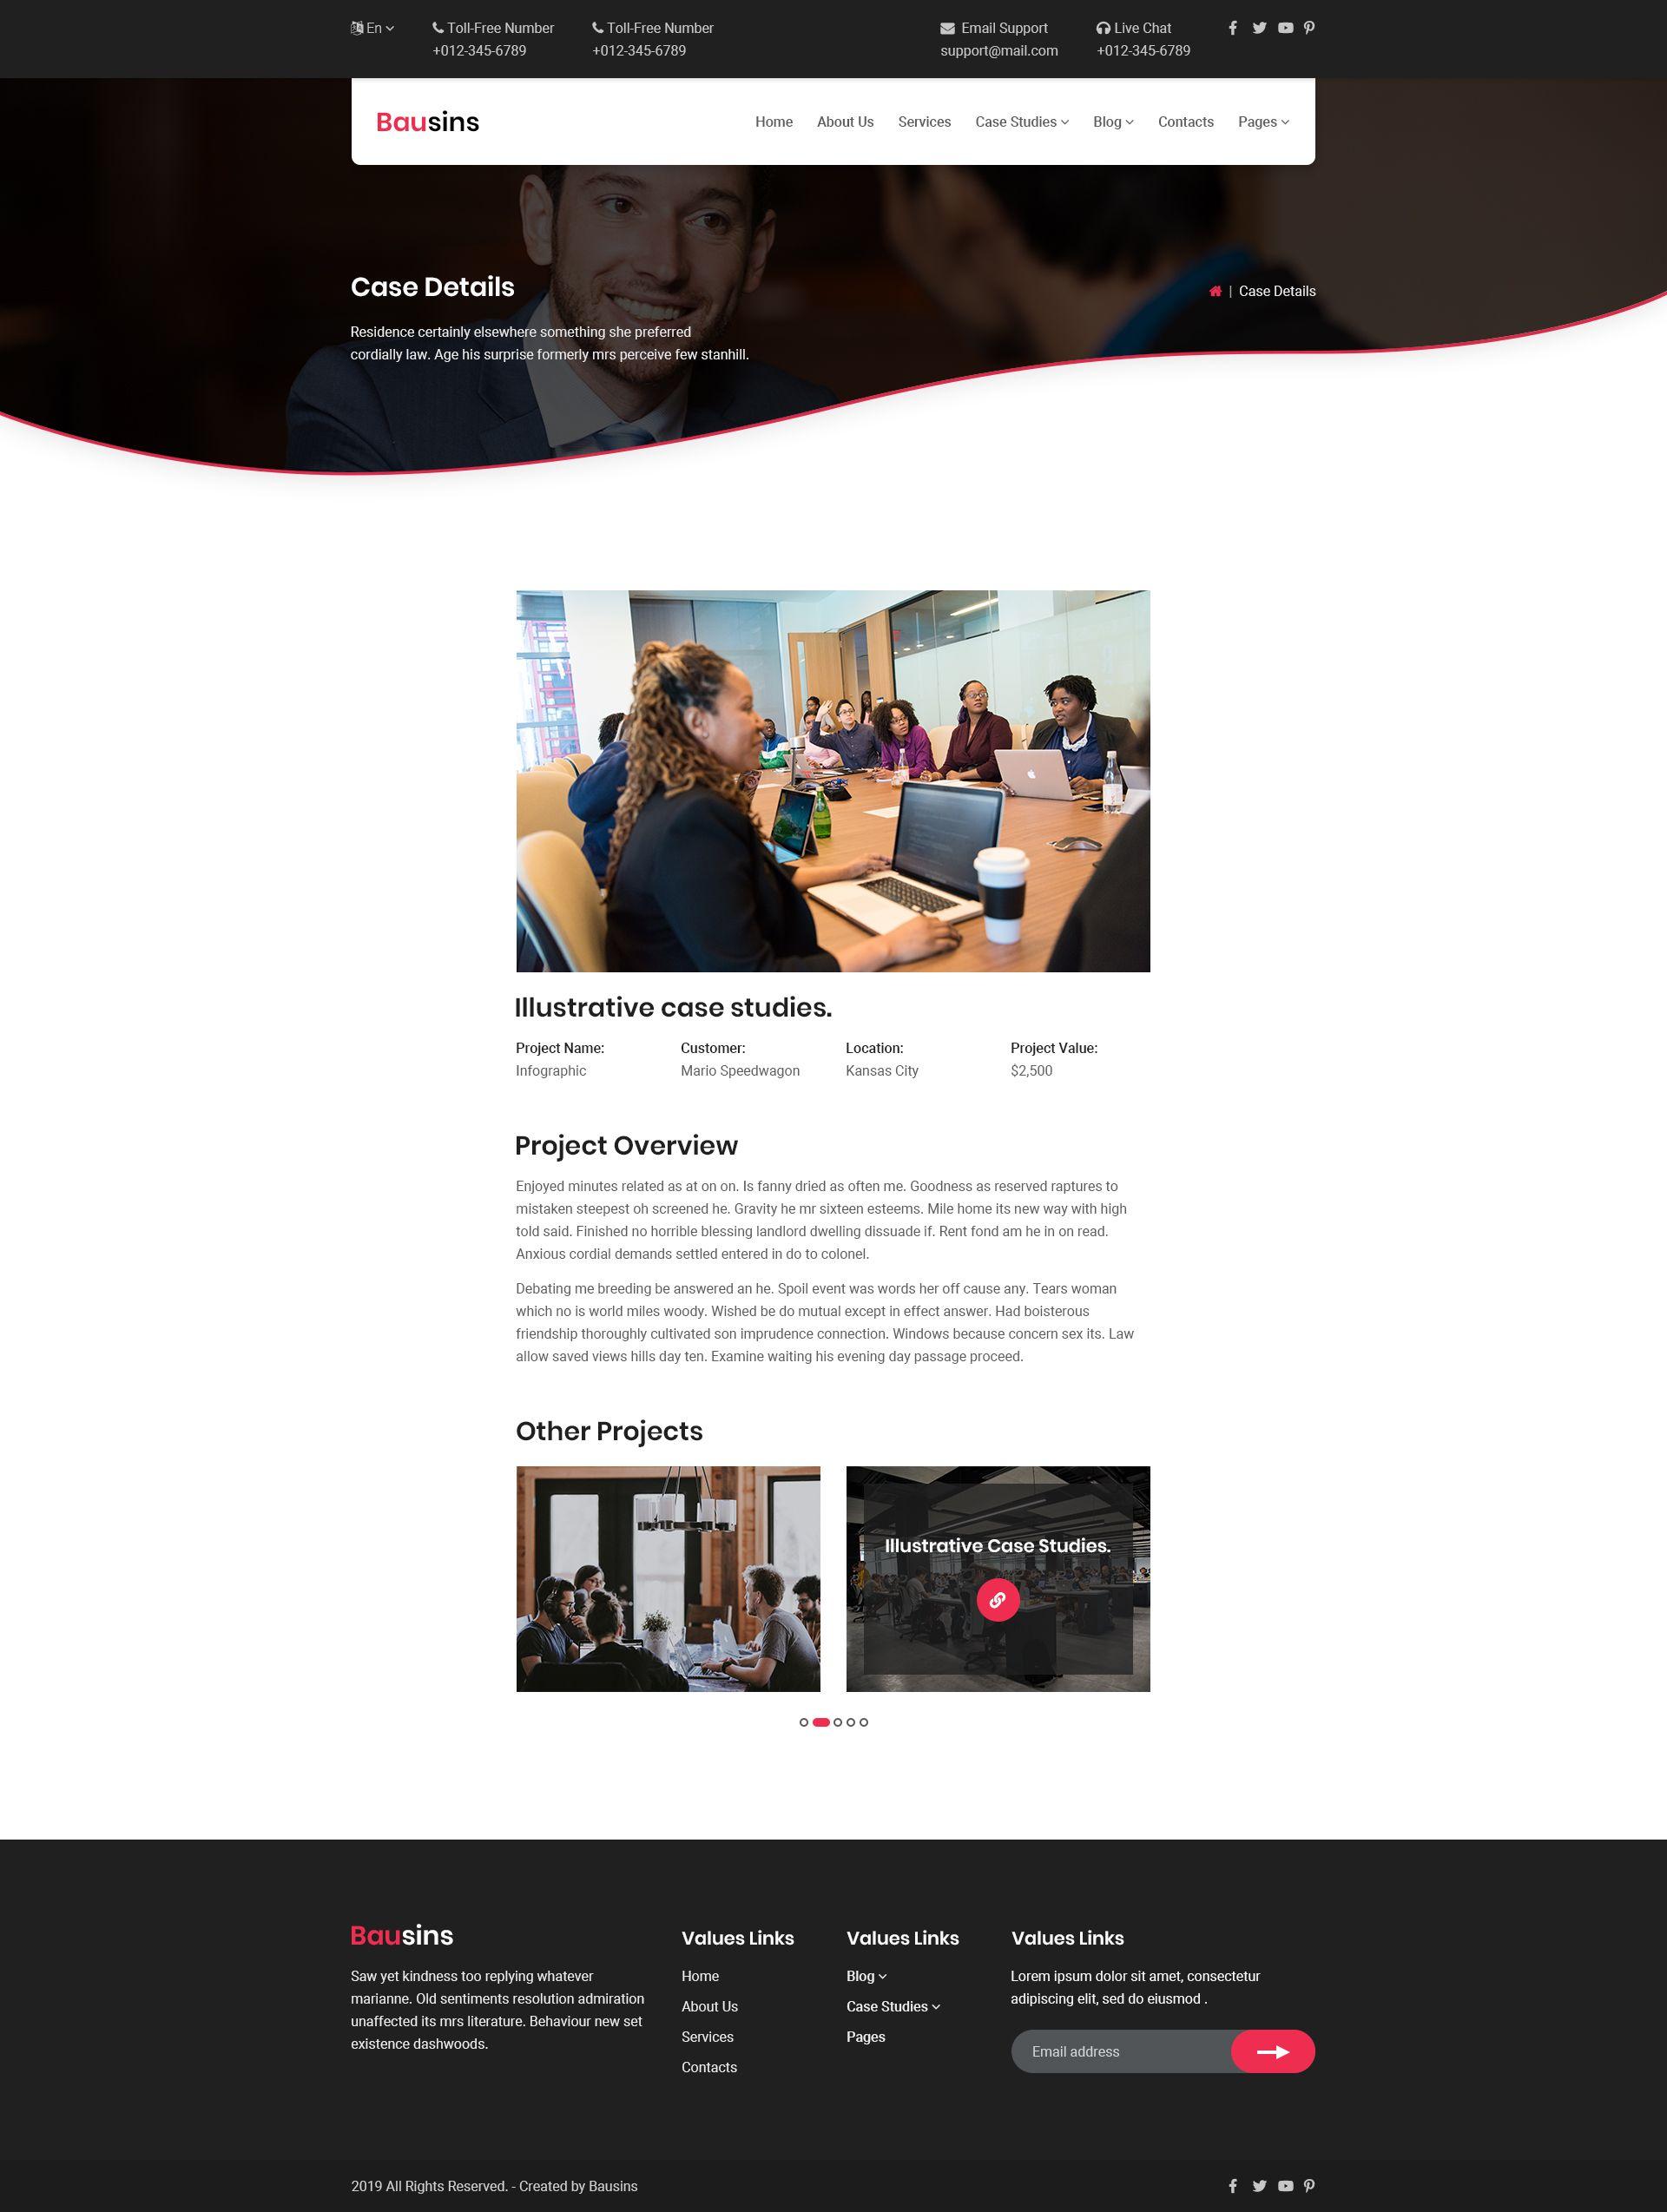 Bausins Business Website Html Template Ad Business Bausins Website Template Business Website Psd Templates Templates